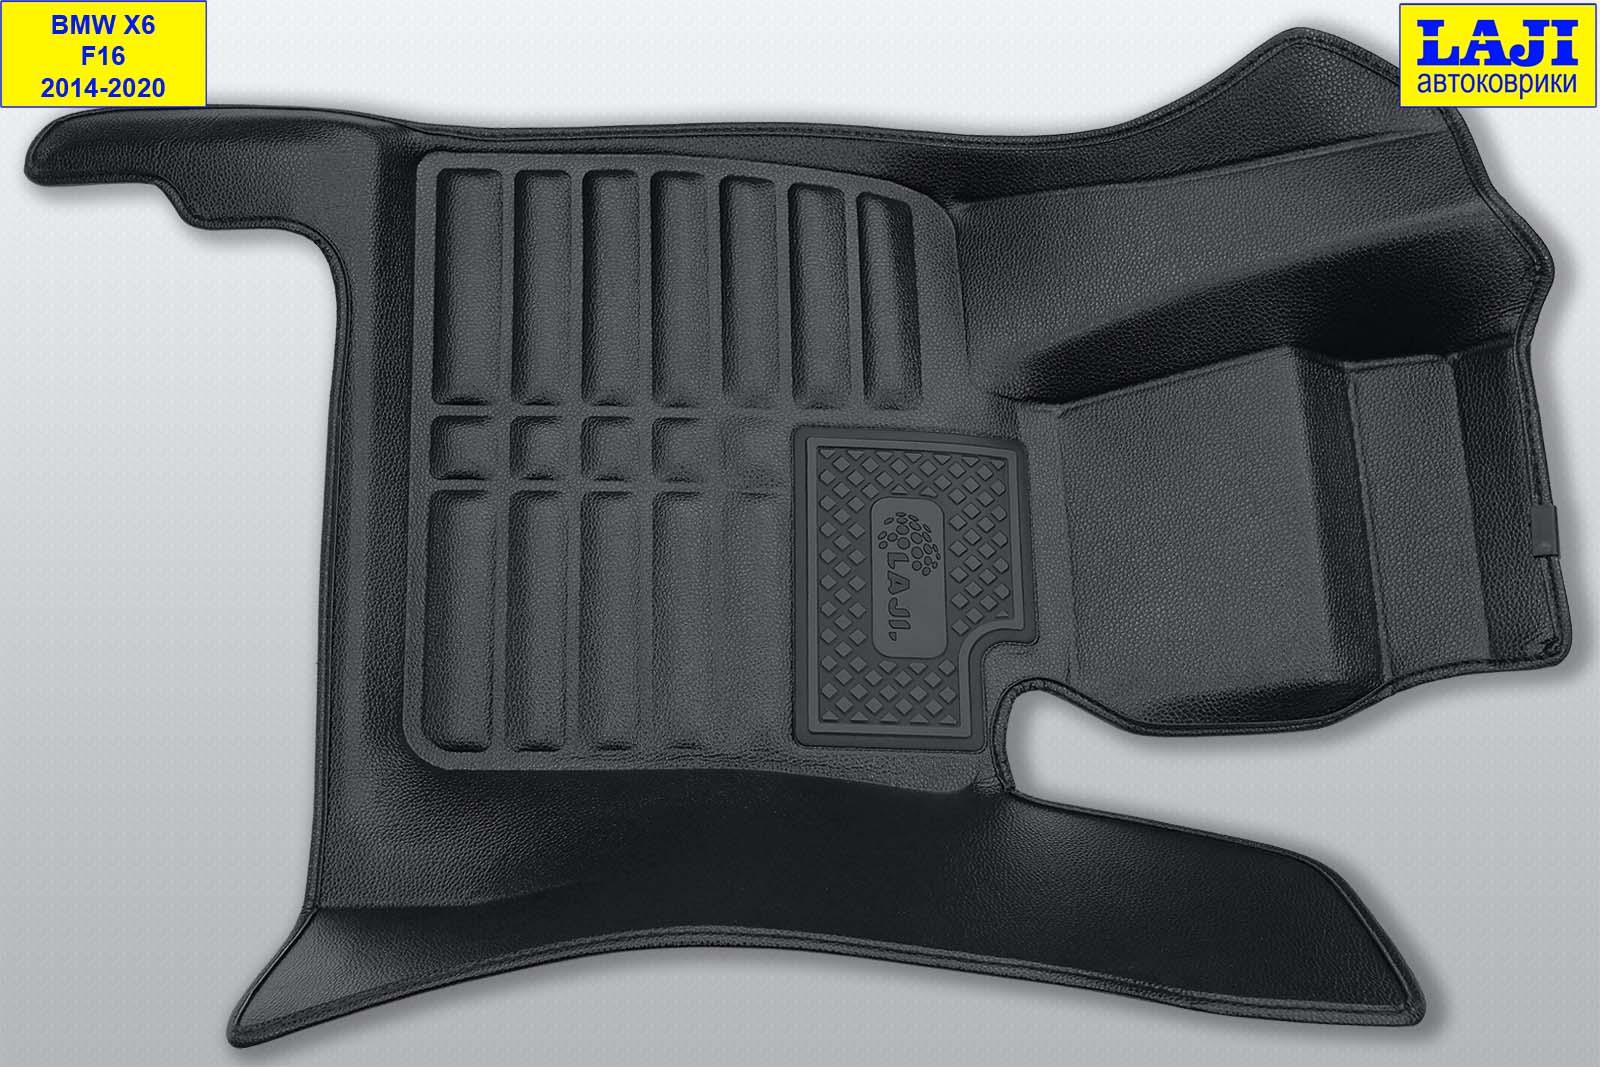 5D коврики в салон BMW X6 (F16) 2014-2020 3